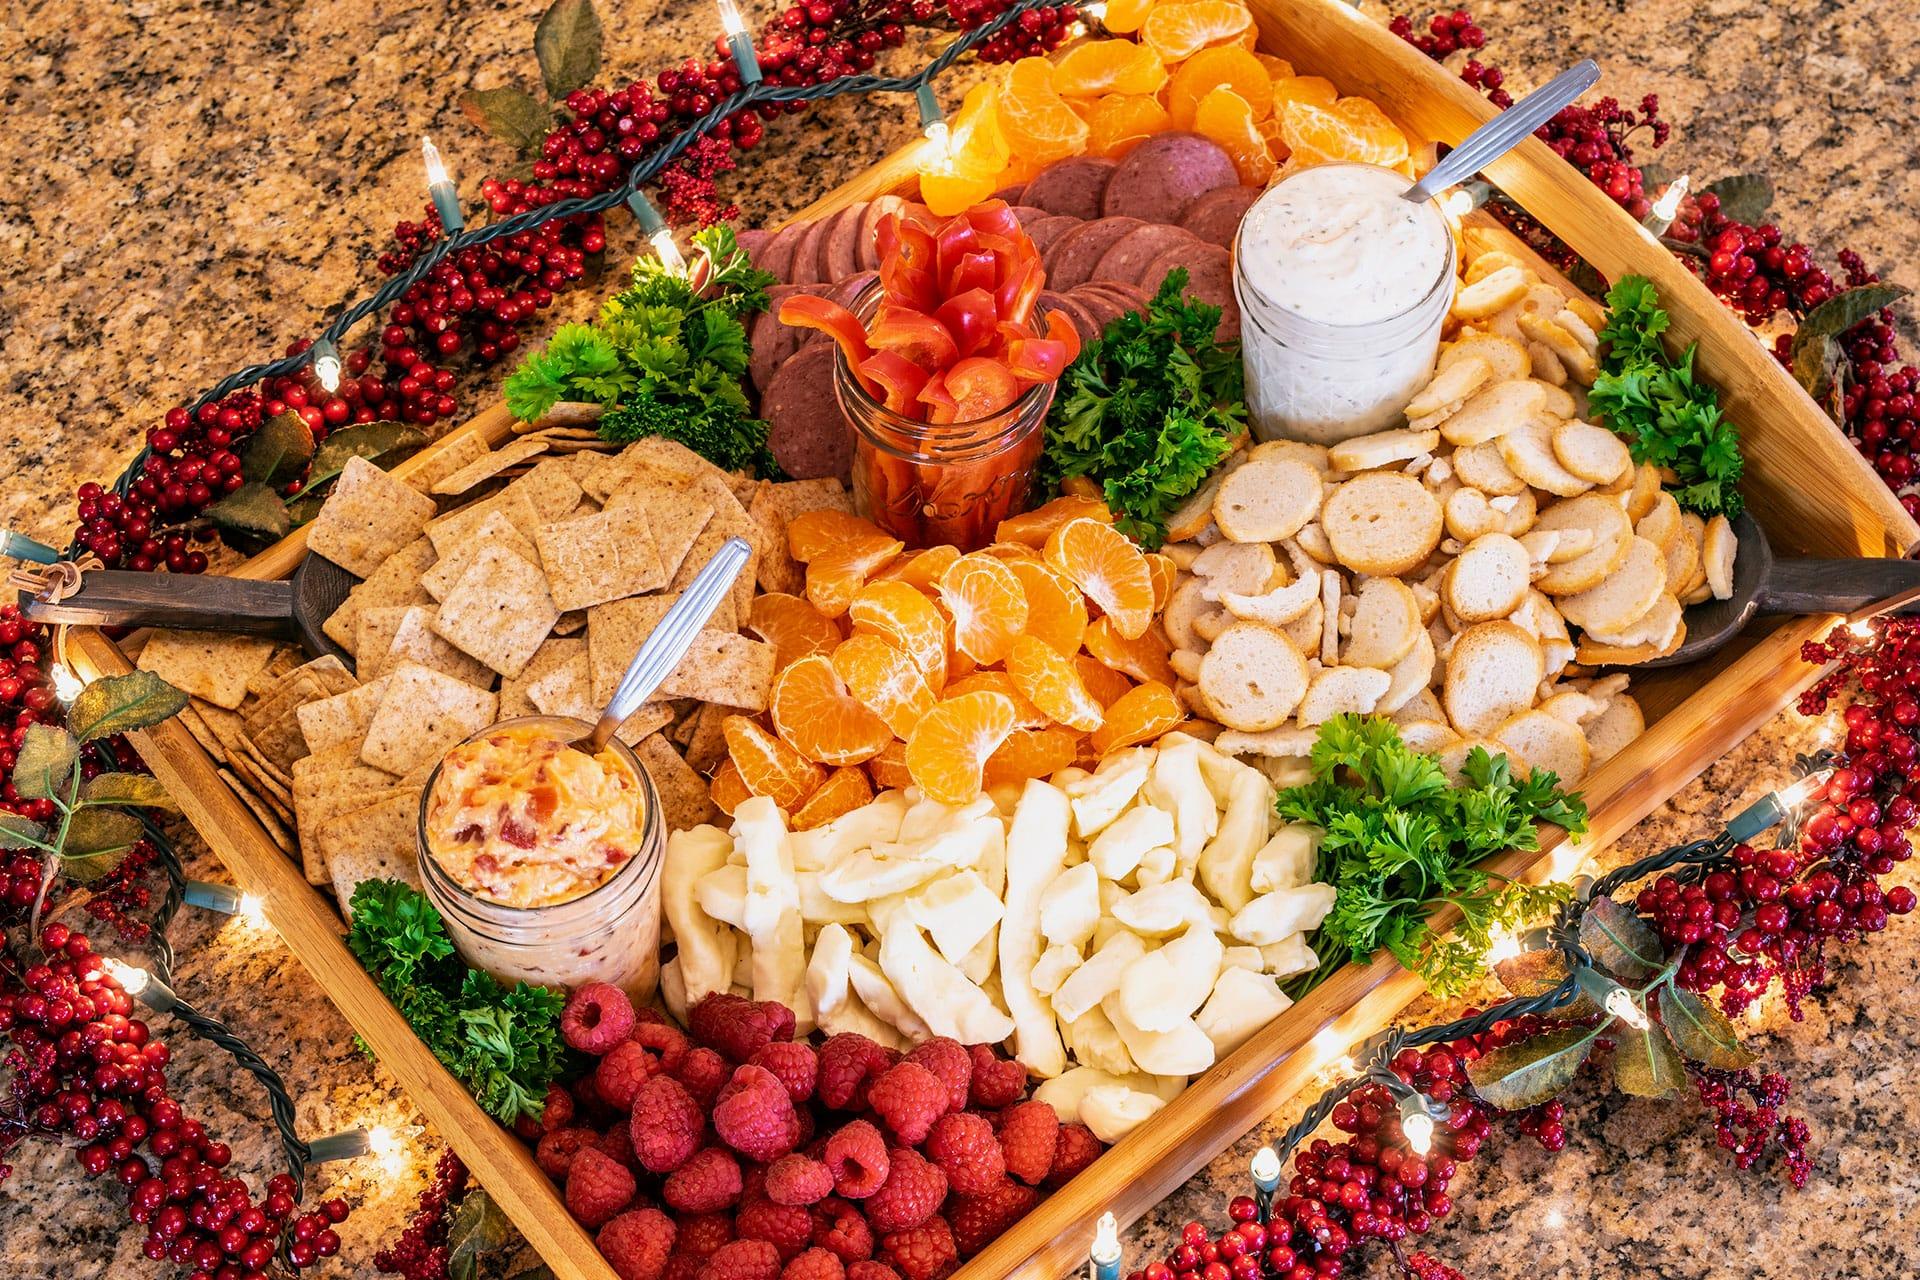 Savory Holiday Entertaining Platter